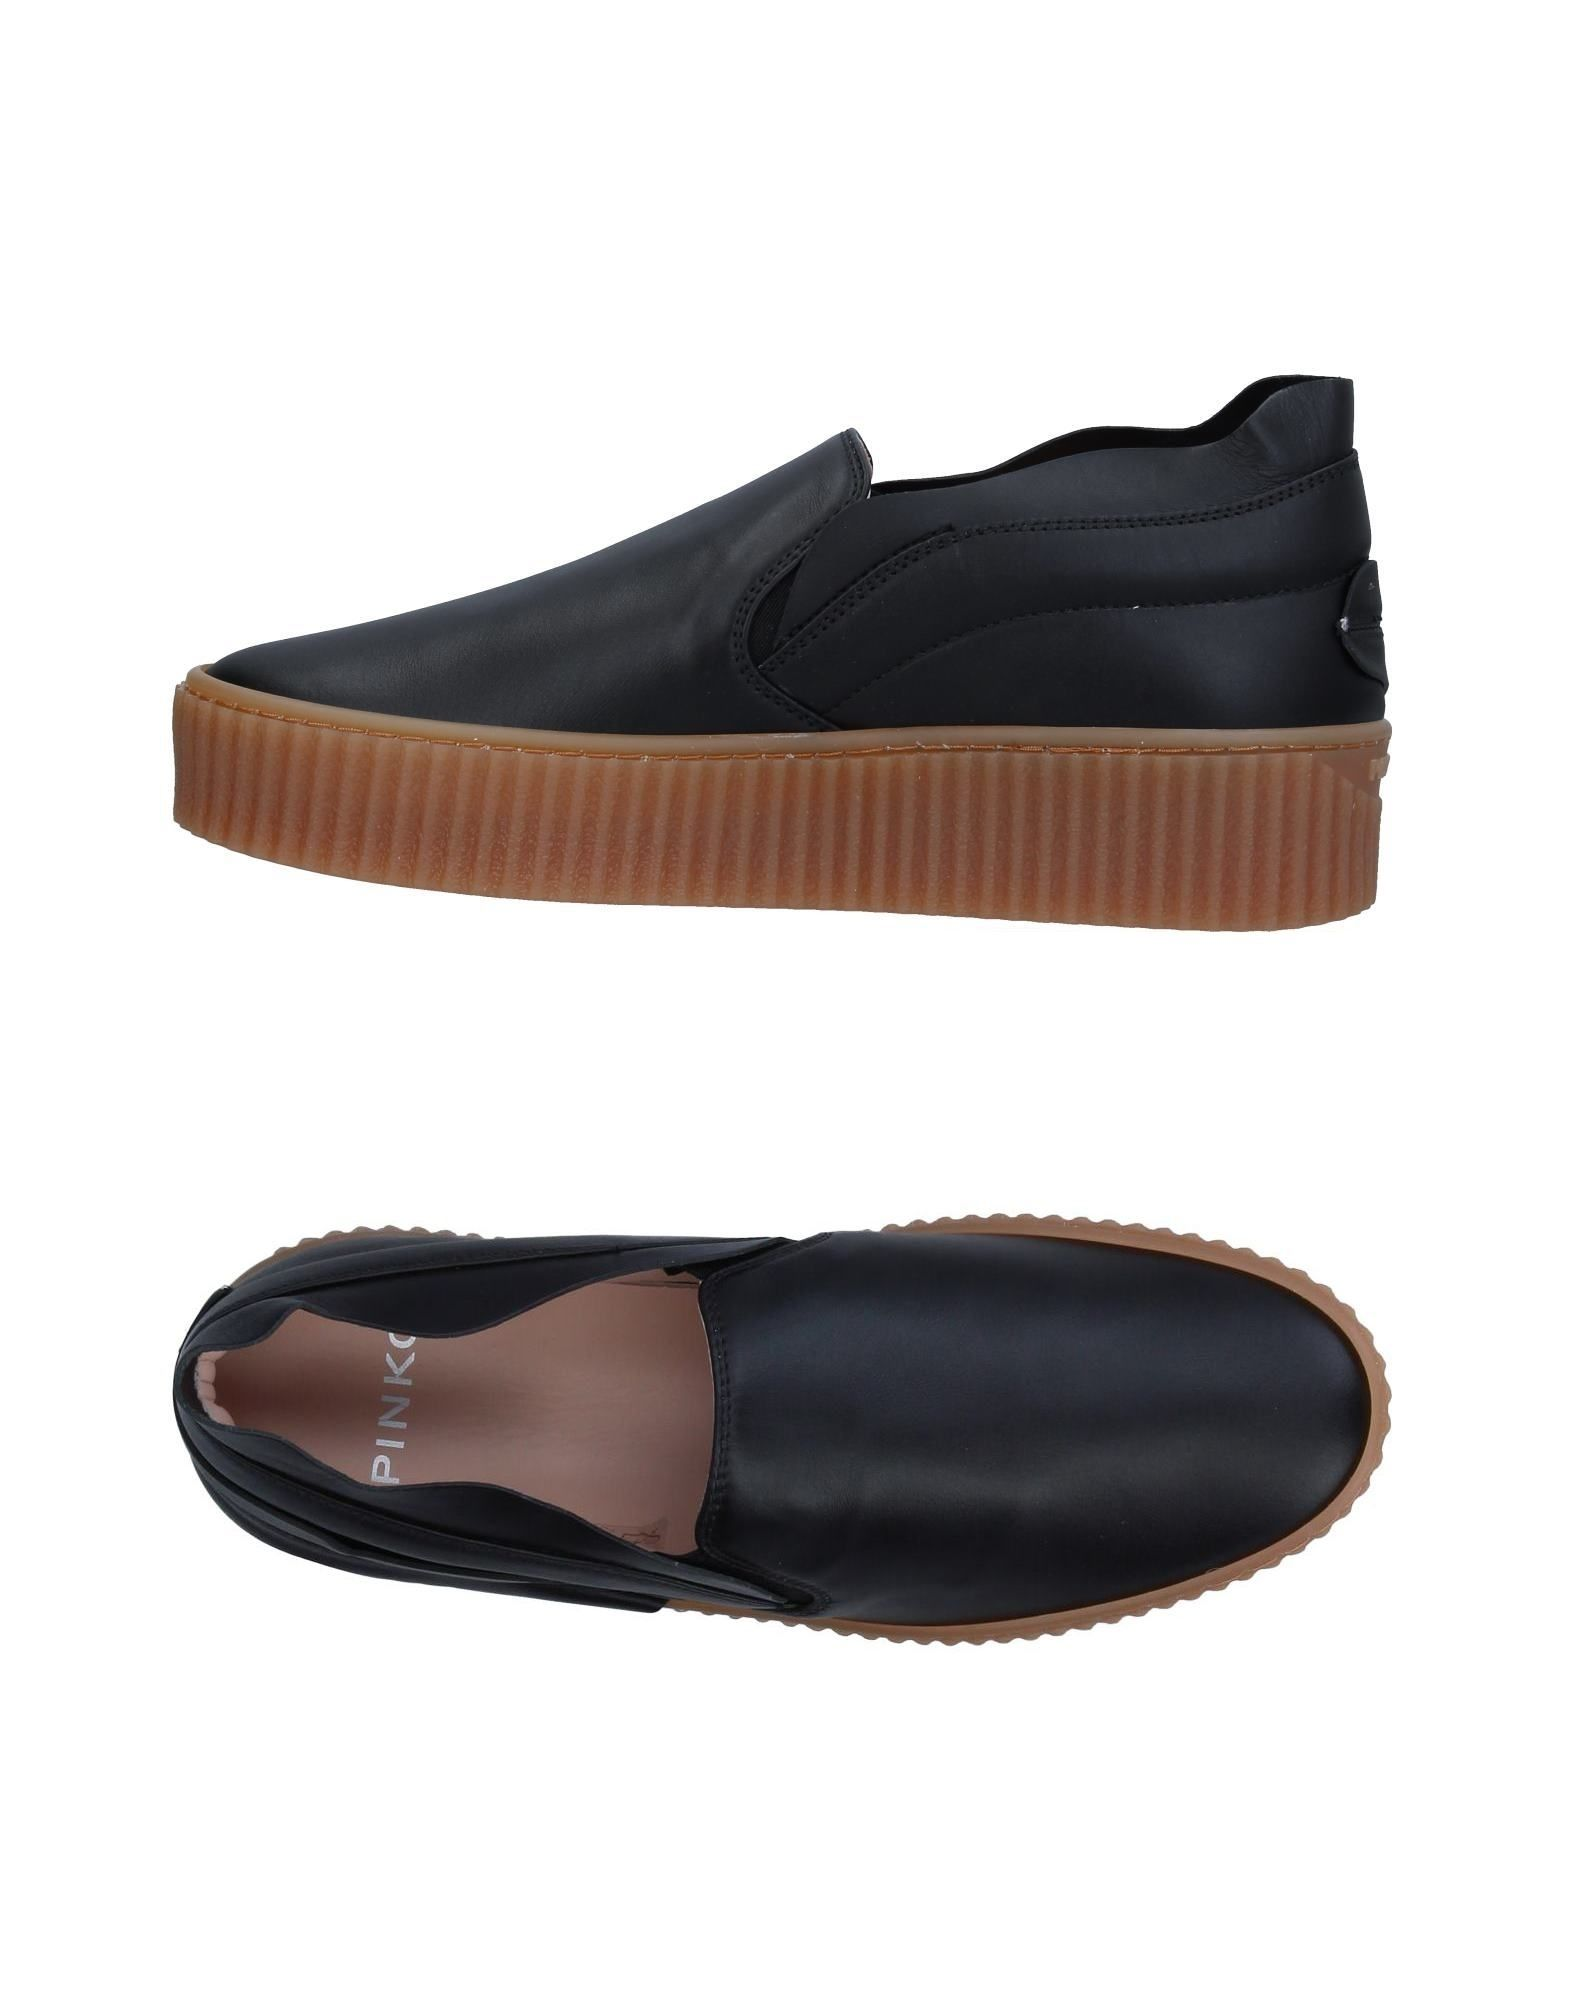 Haltbare Mode billige Schuhe Pinko Sneakers Damen  11369887OW Heiße Schuhe